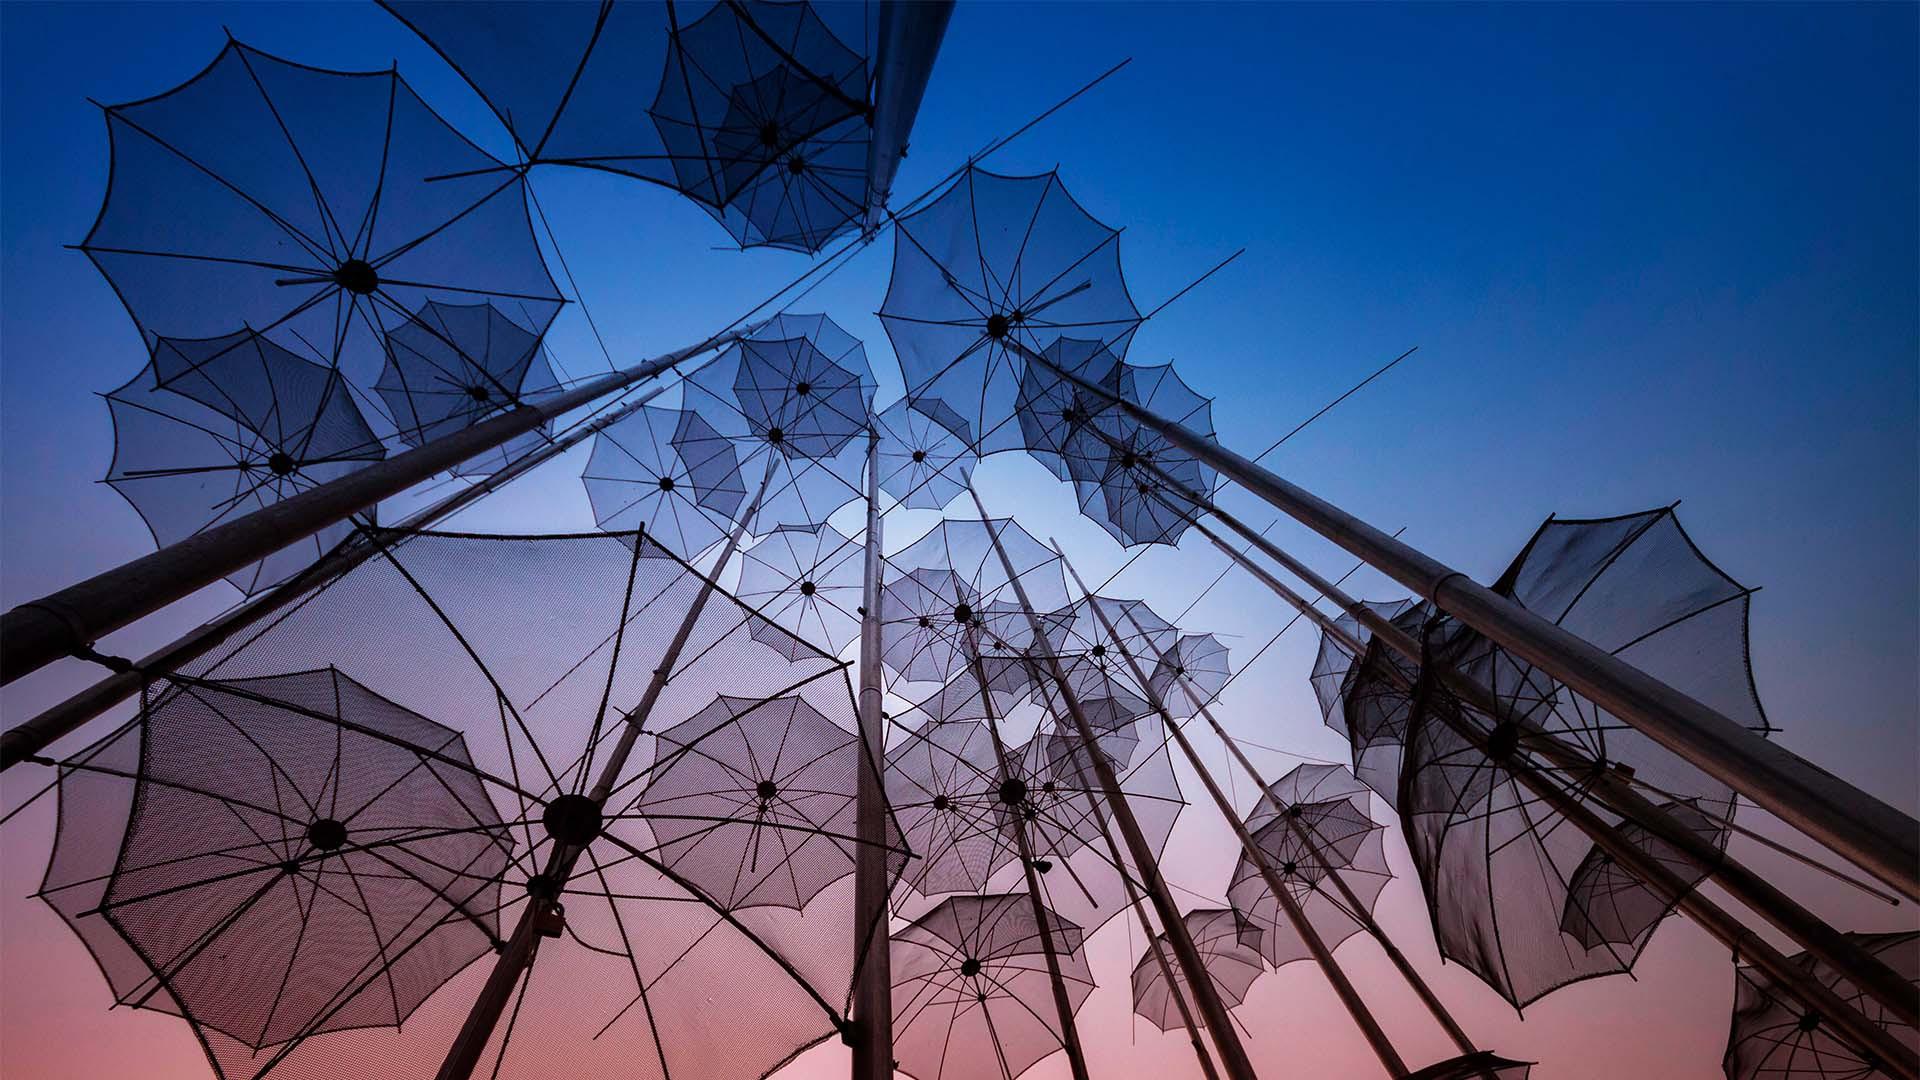 The famous umbrellas of Thessaloniki, Greece